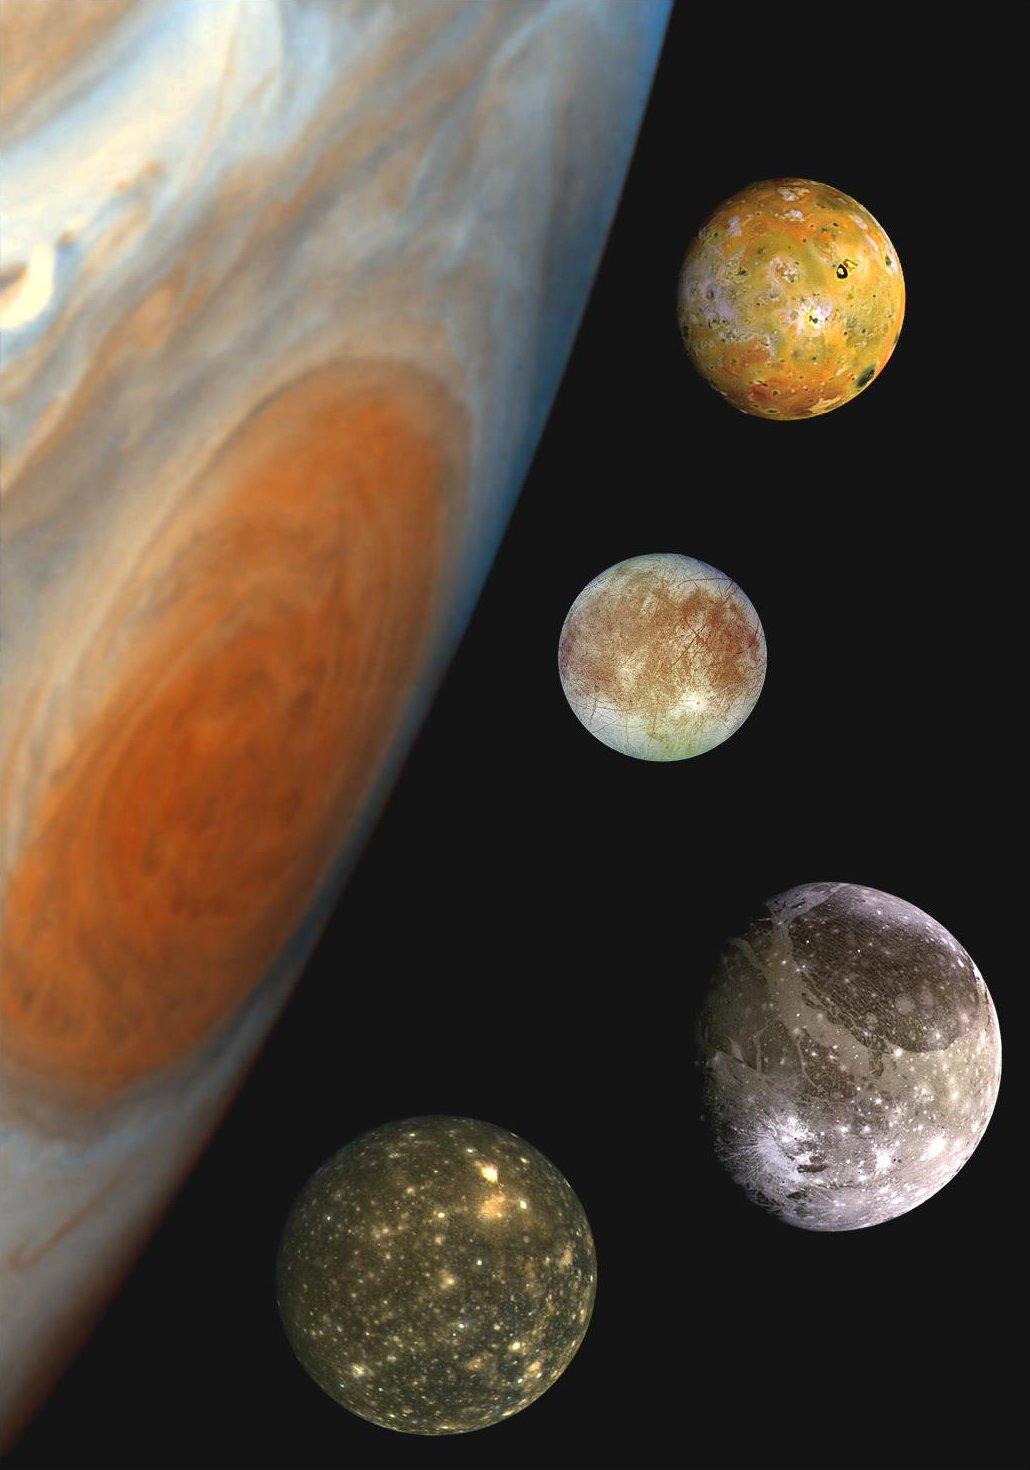 jupiter_and_the_galilean_satellites.jpg